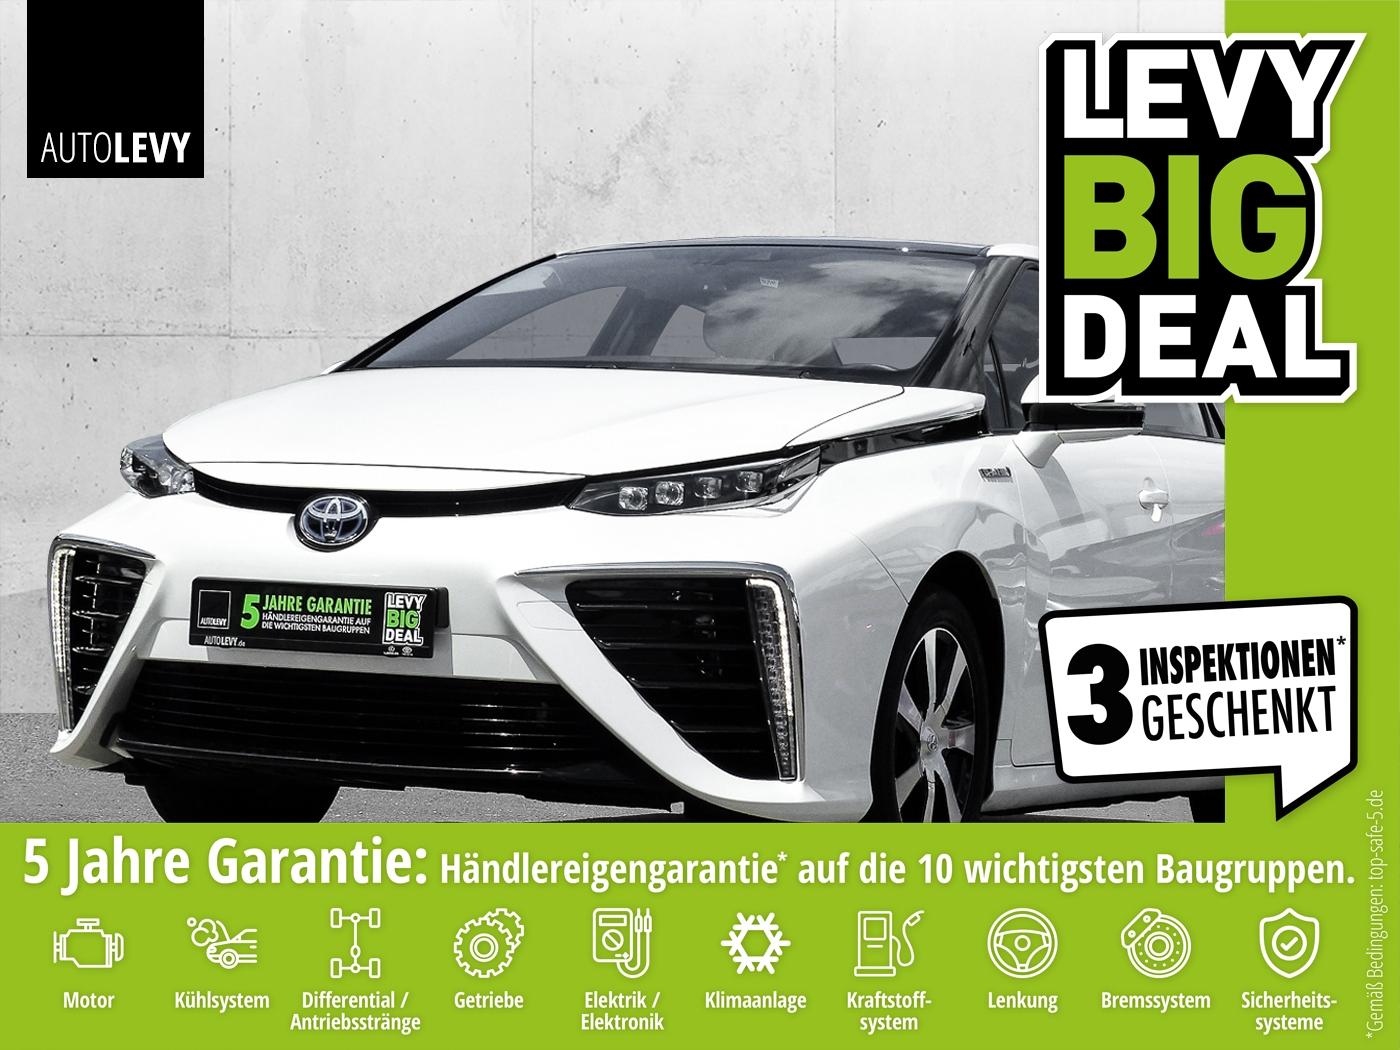 Toyota MIRAI Brennstoffzelle LED*Navi*ACC*Keyless*4xSHZ, Jahr 2018, hydrogenium